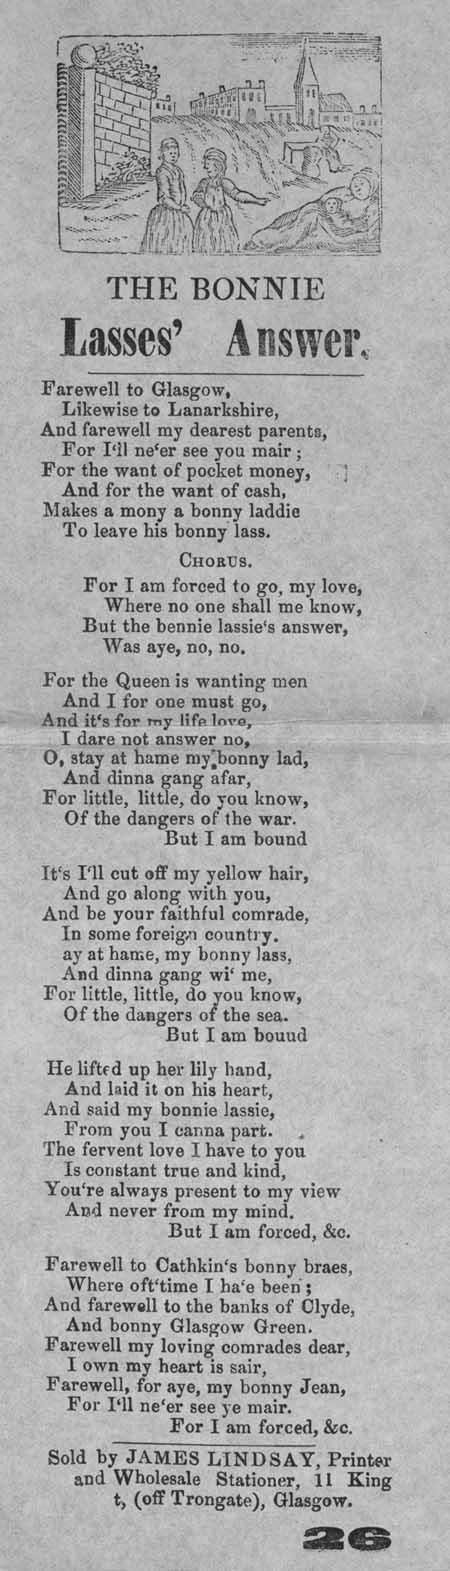 Broadside ballad entitled 'The Bonnie Lasses' Answer'